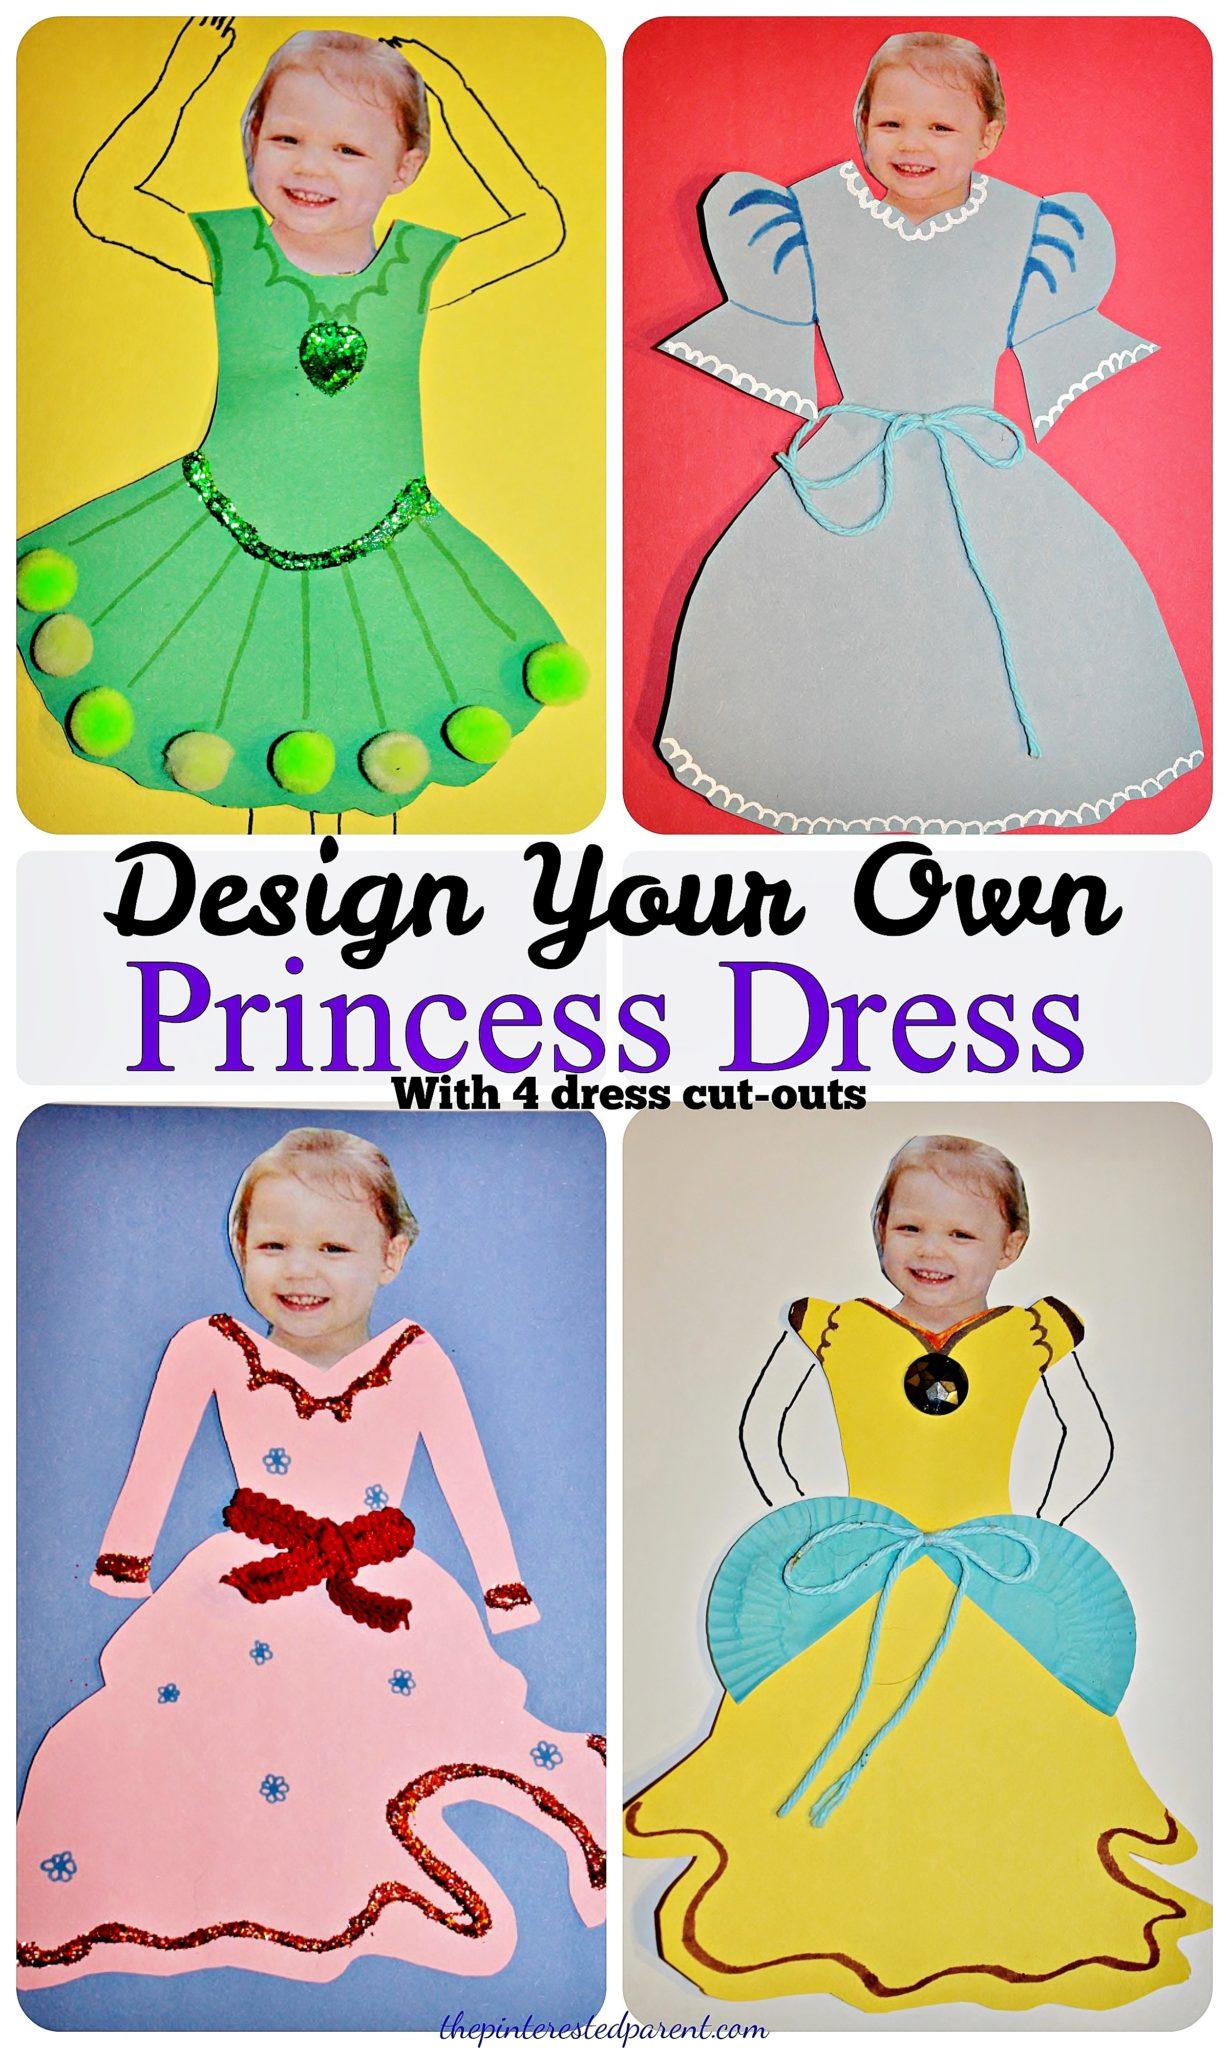 Let Your Kid Design Her Own Dress